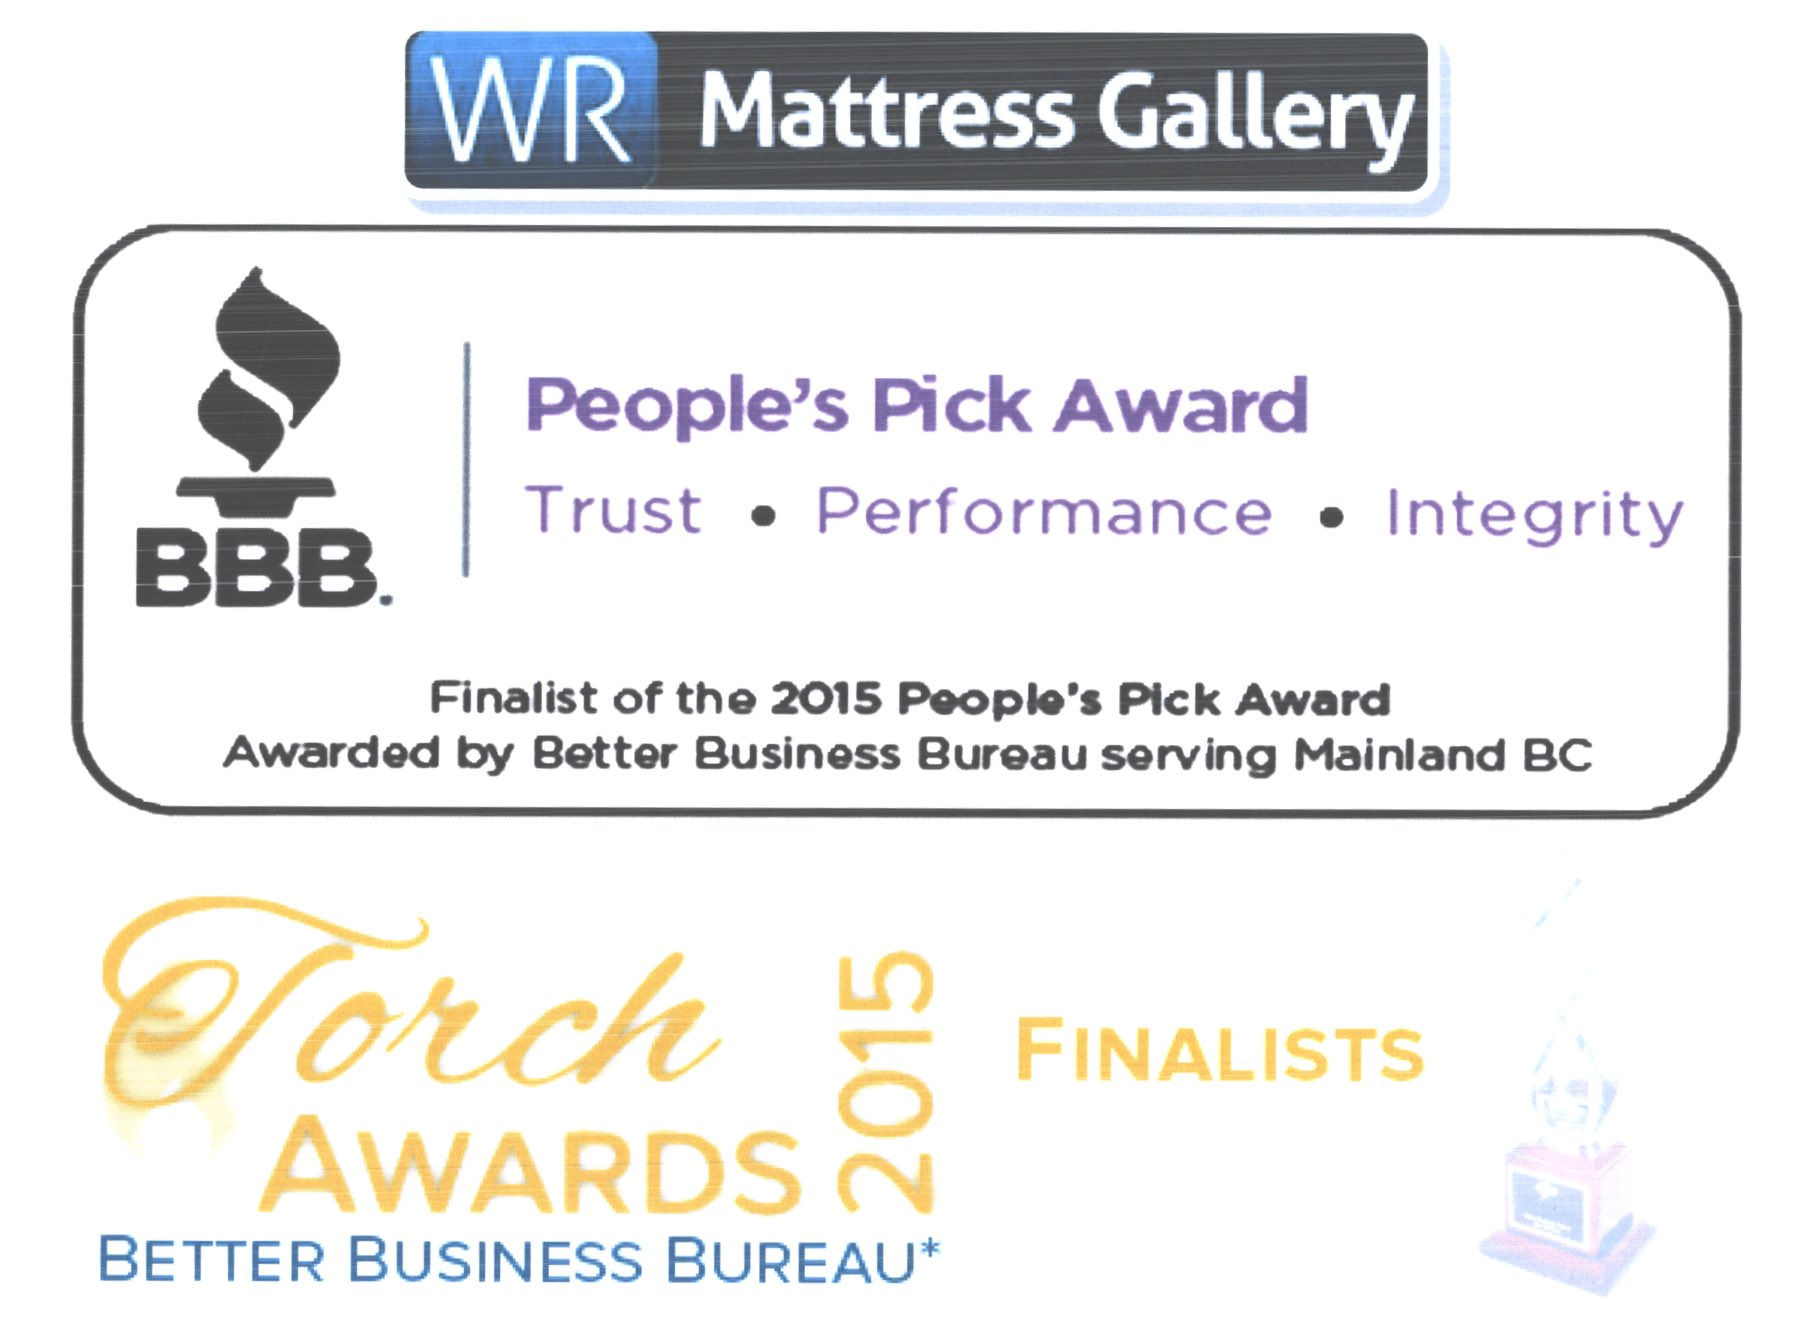 People's pick award wr mattress